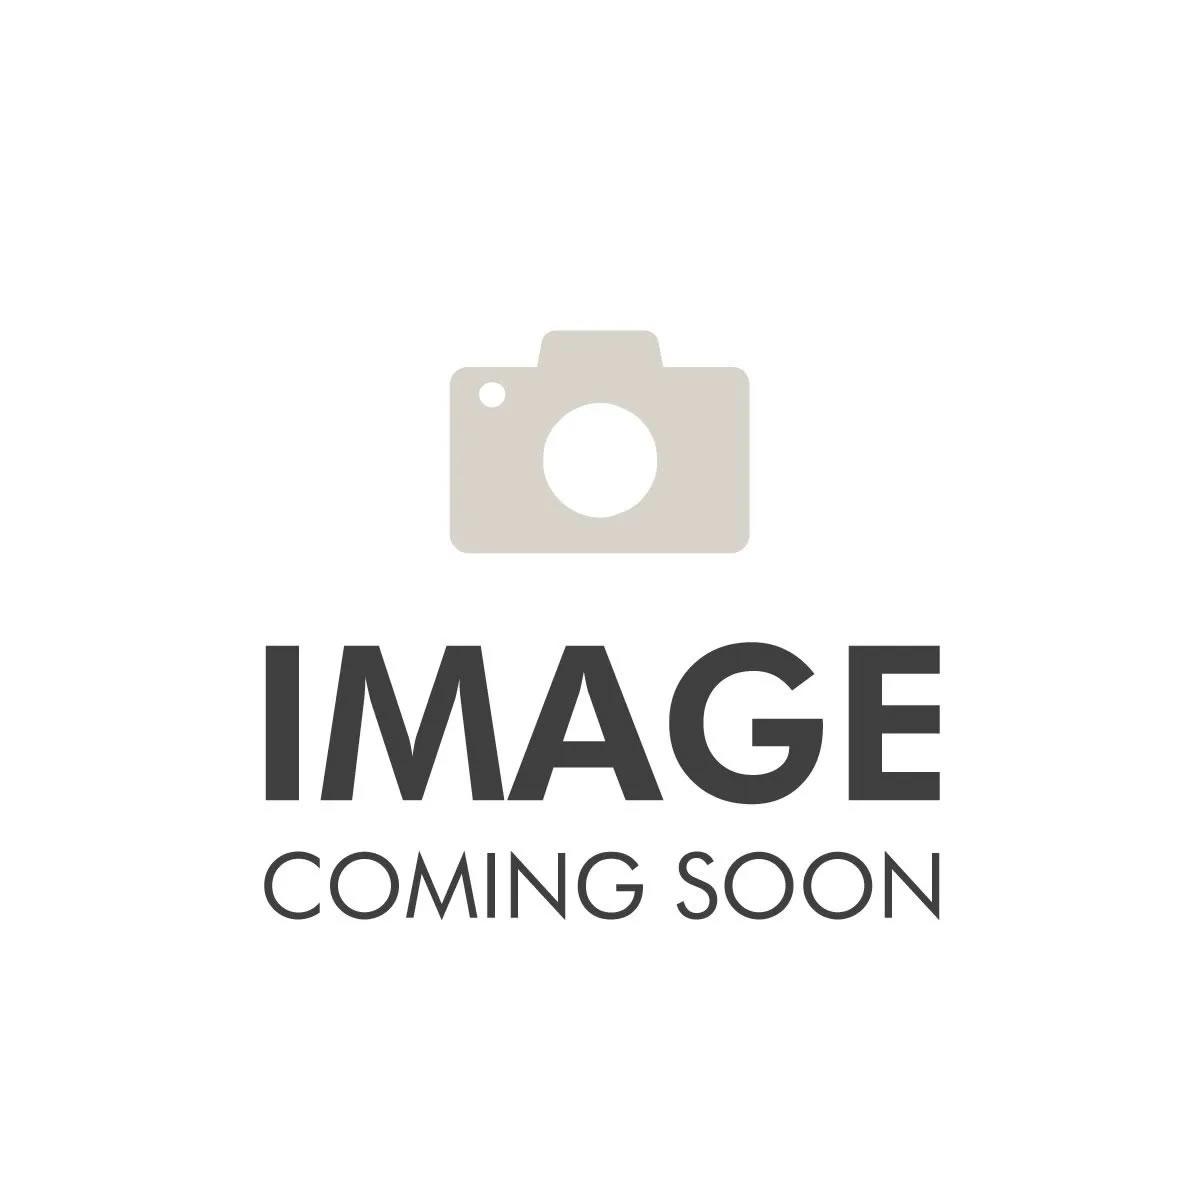 Lower Power Steering Seal Kit; 87-98 Grand Cherokee/Wrangler ZJ/YJ